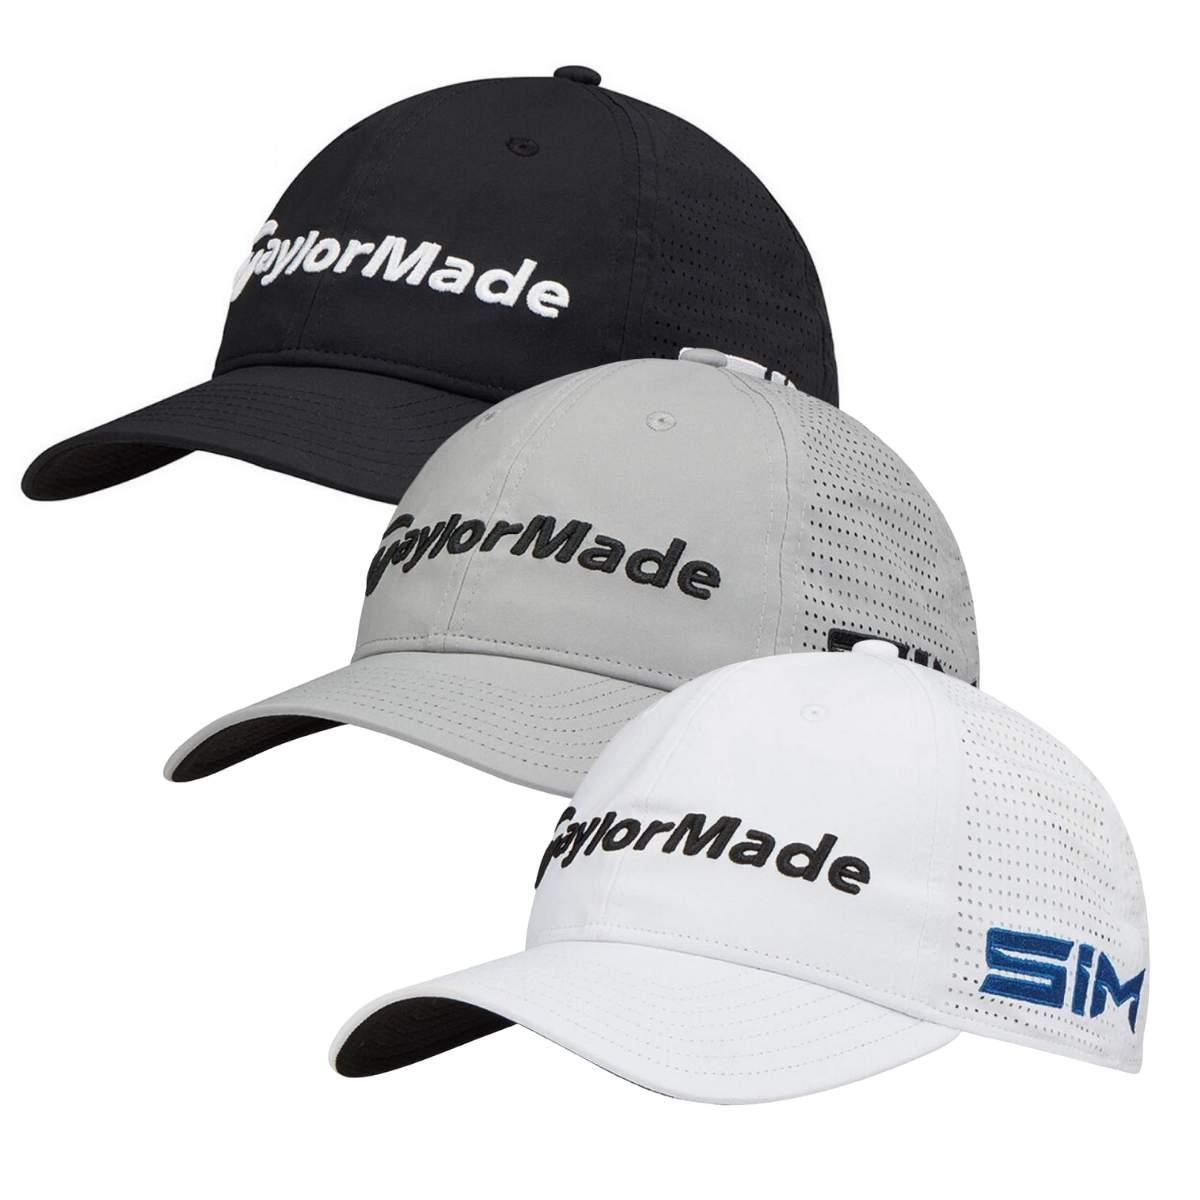 TaylorMade 2020 Men's Tour Litetech Cap